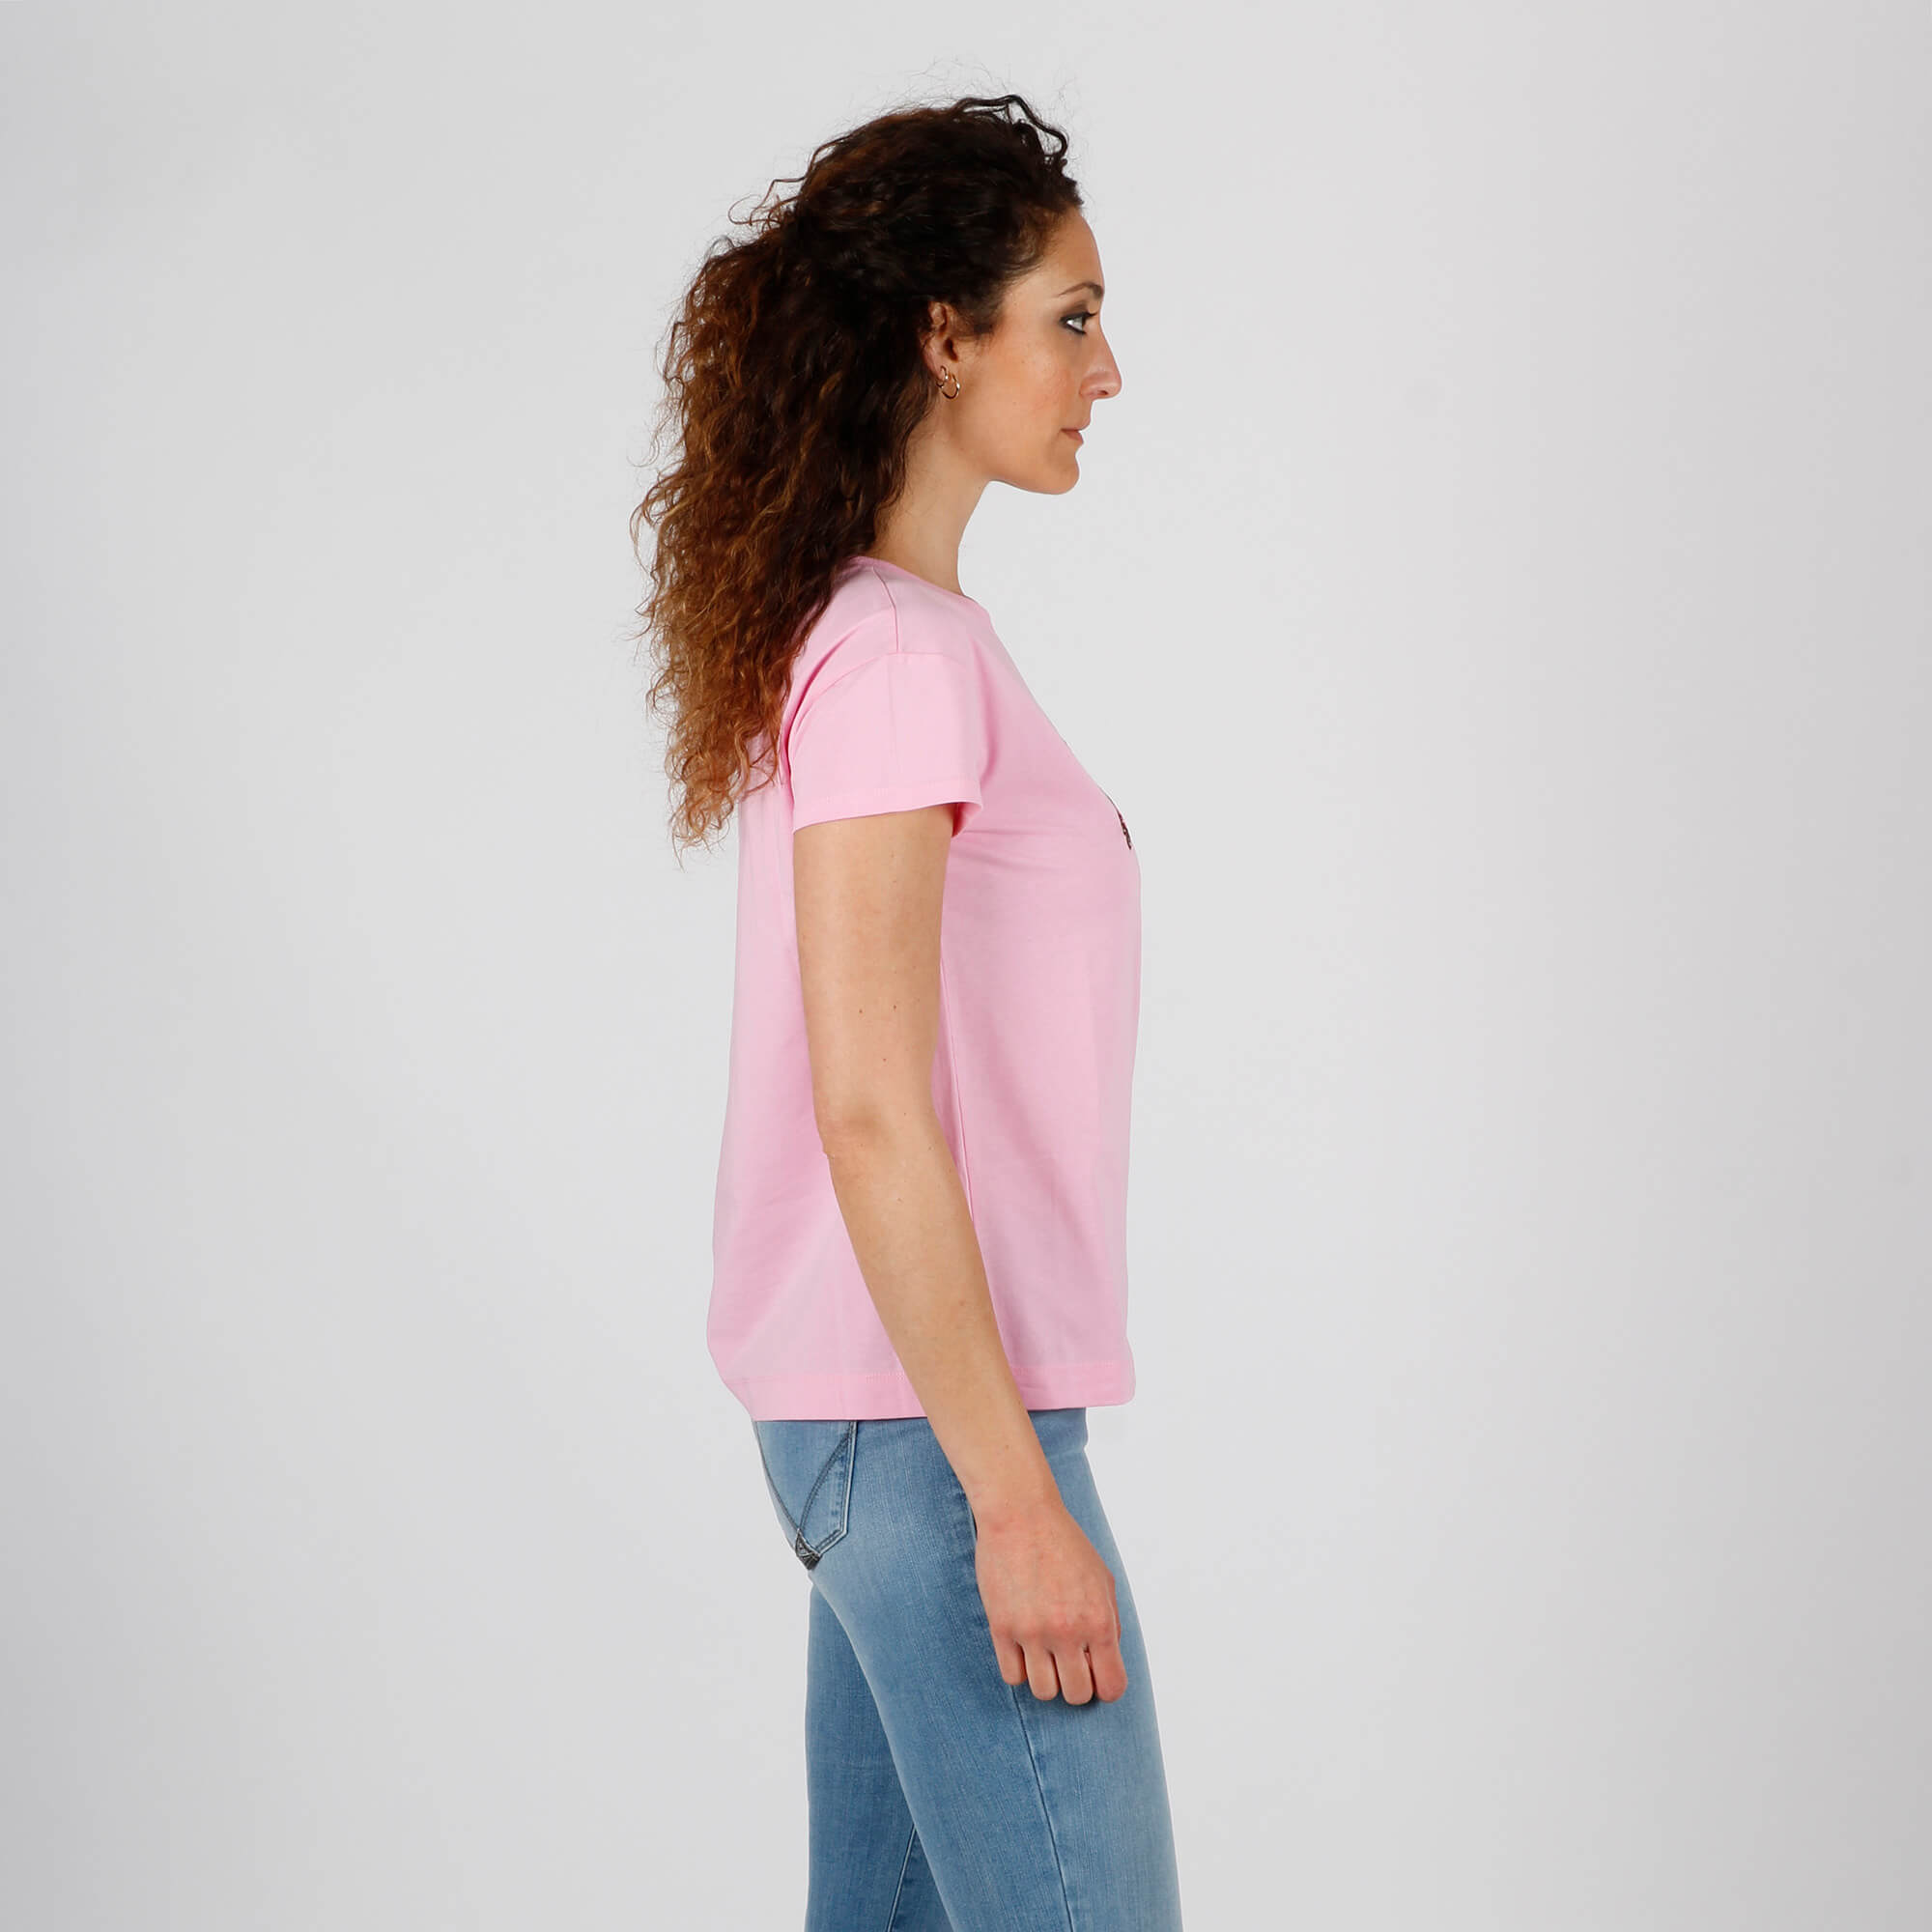 T-shirt stampa gelato gattino - Rosa